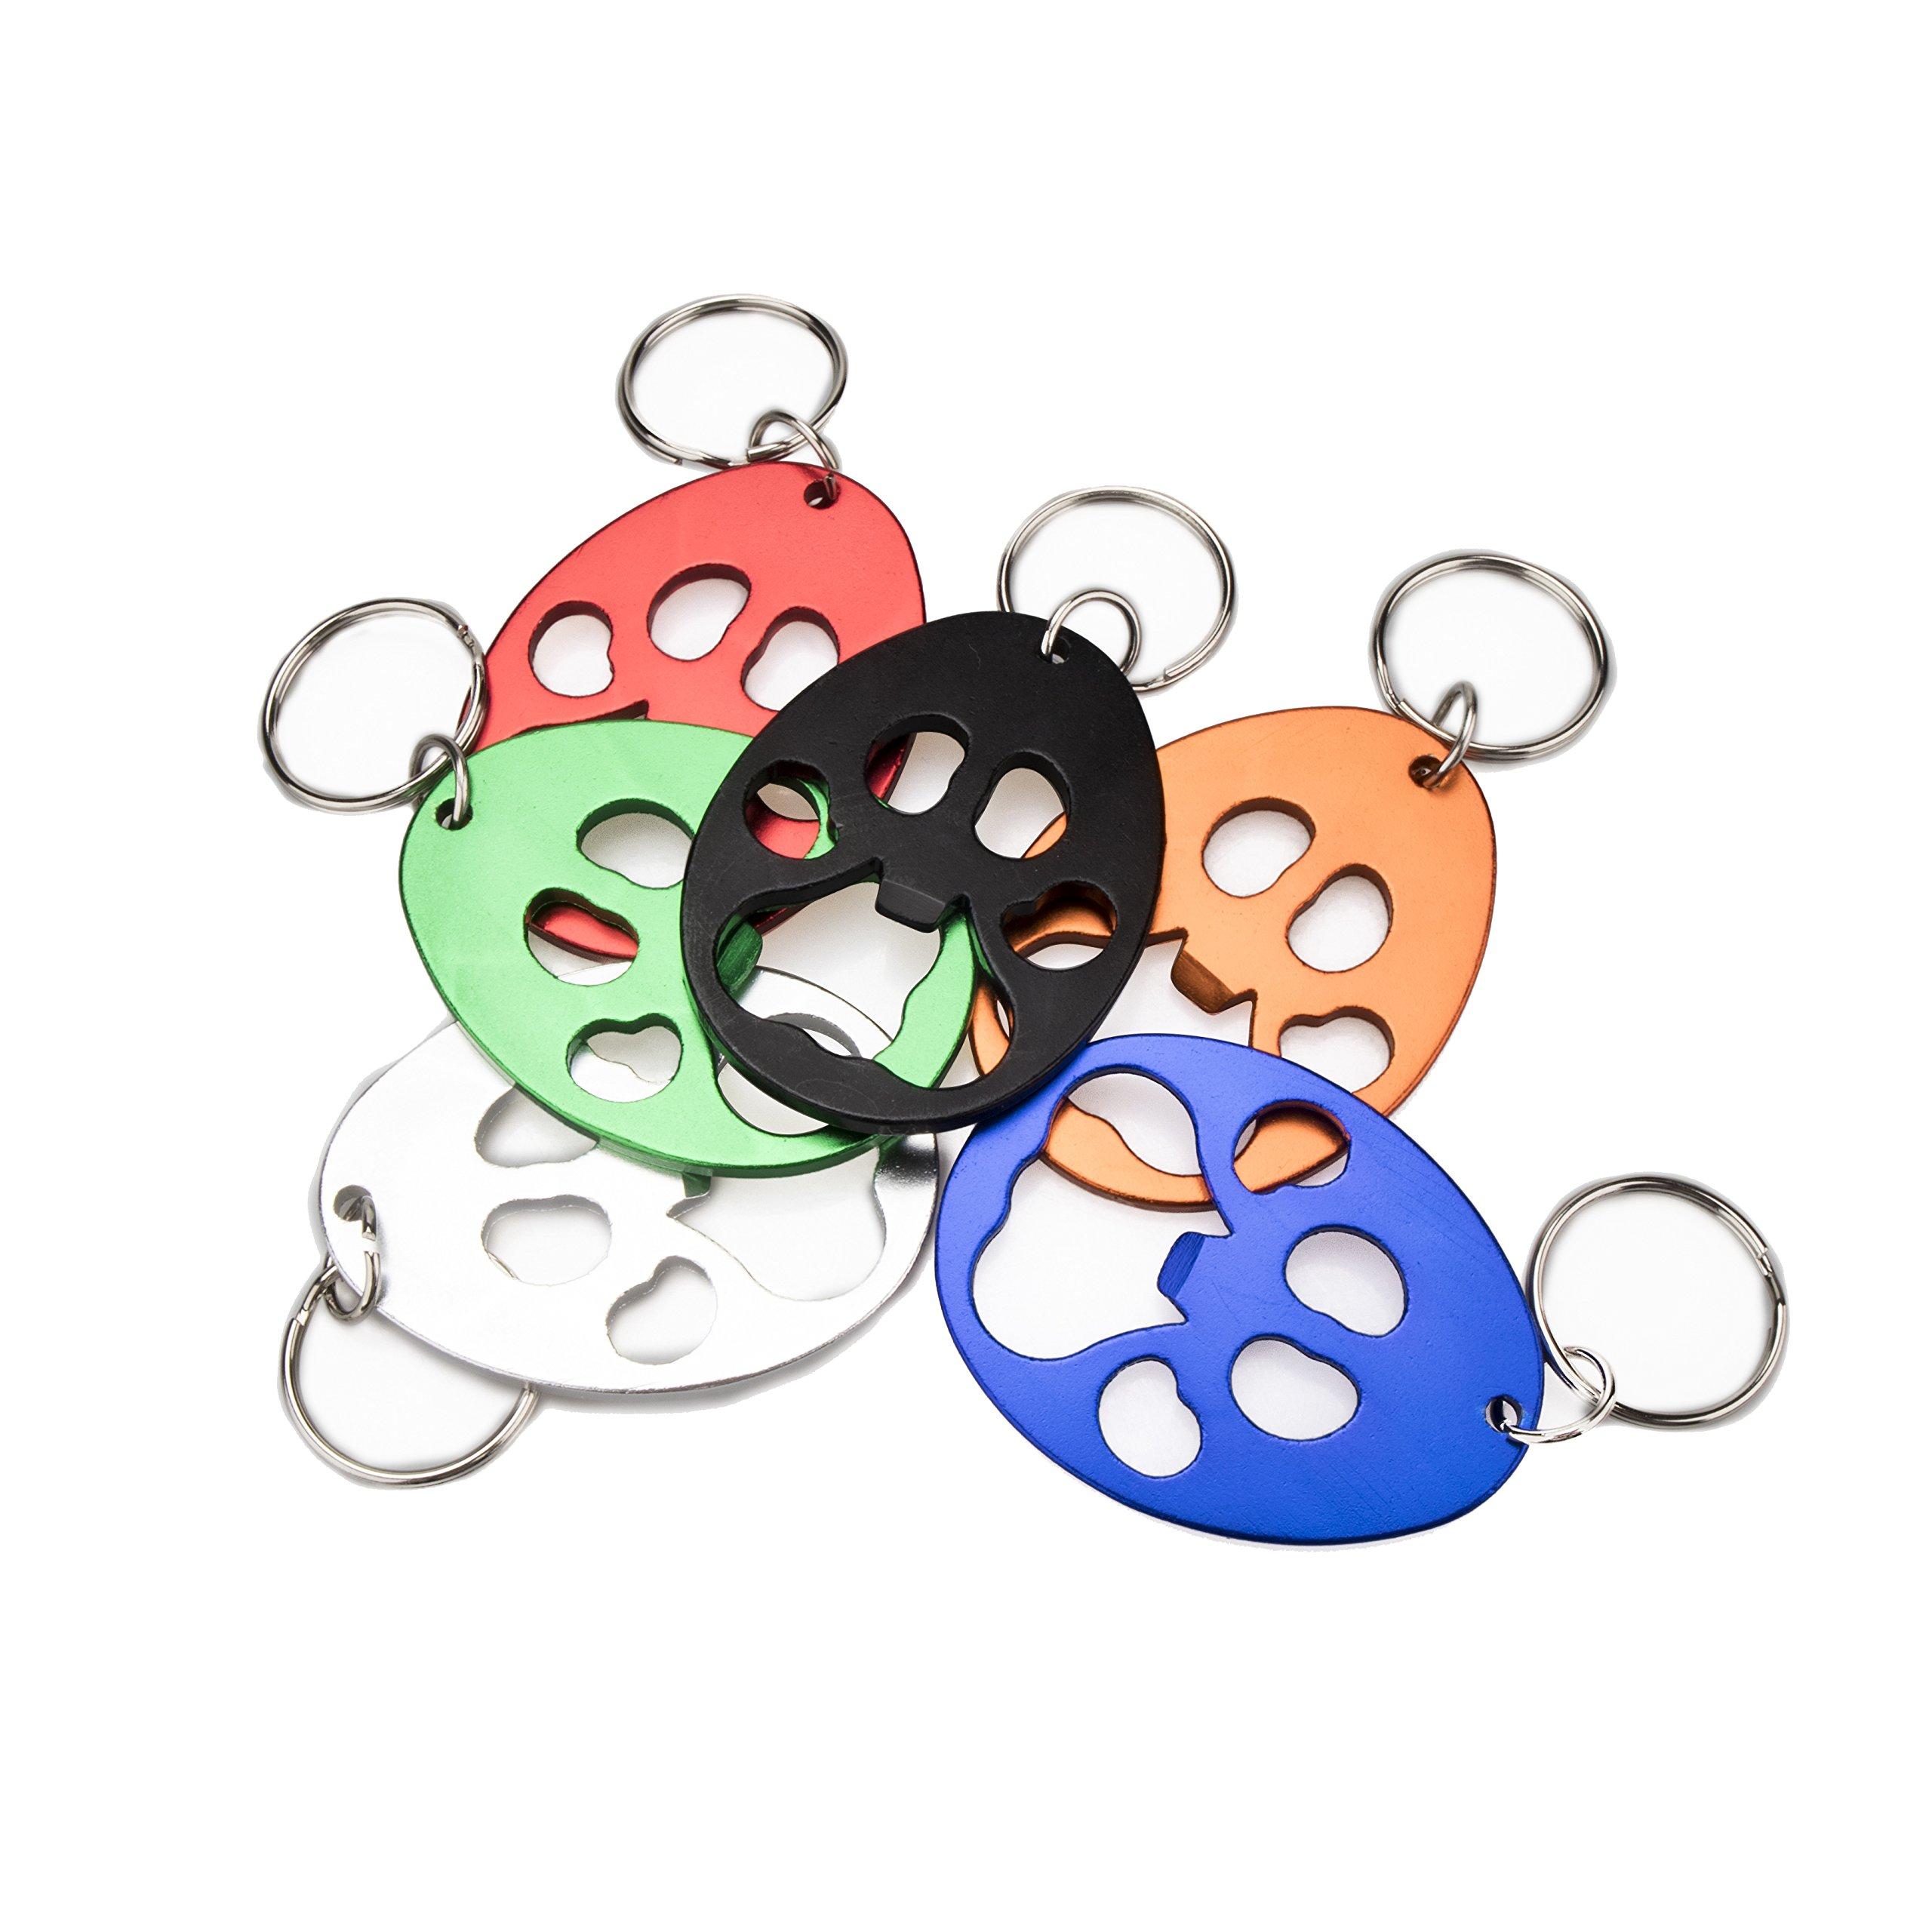 Swatom Bear's-Paw Keychain Bottle Opener Beer Opener Tool, Key Tag Chain Ring, 100 Piece